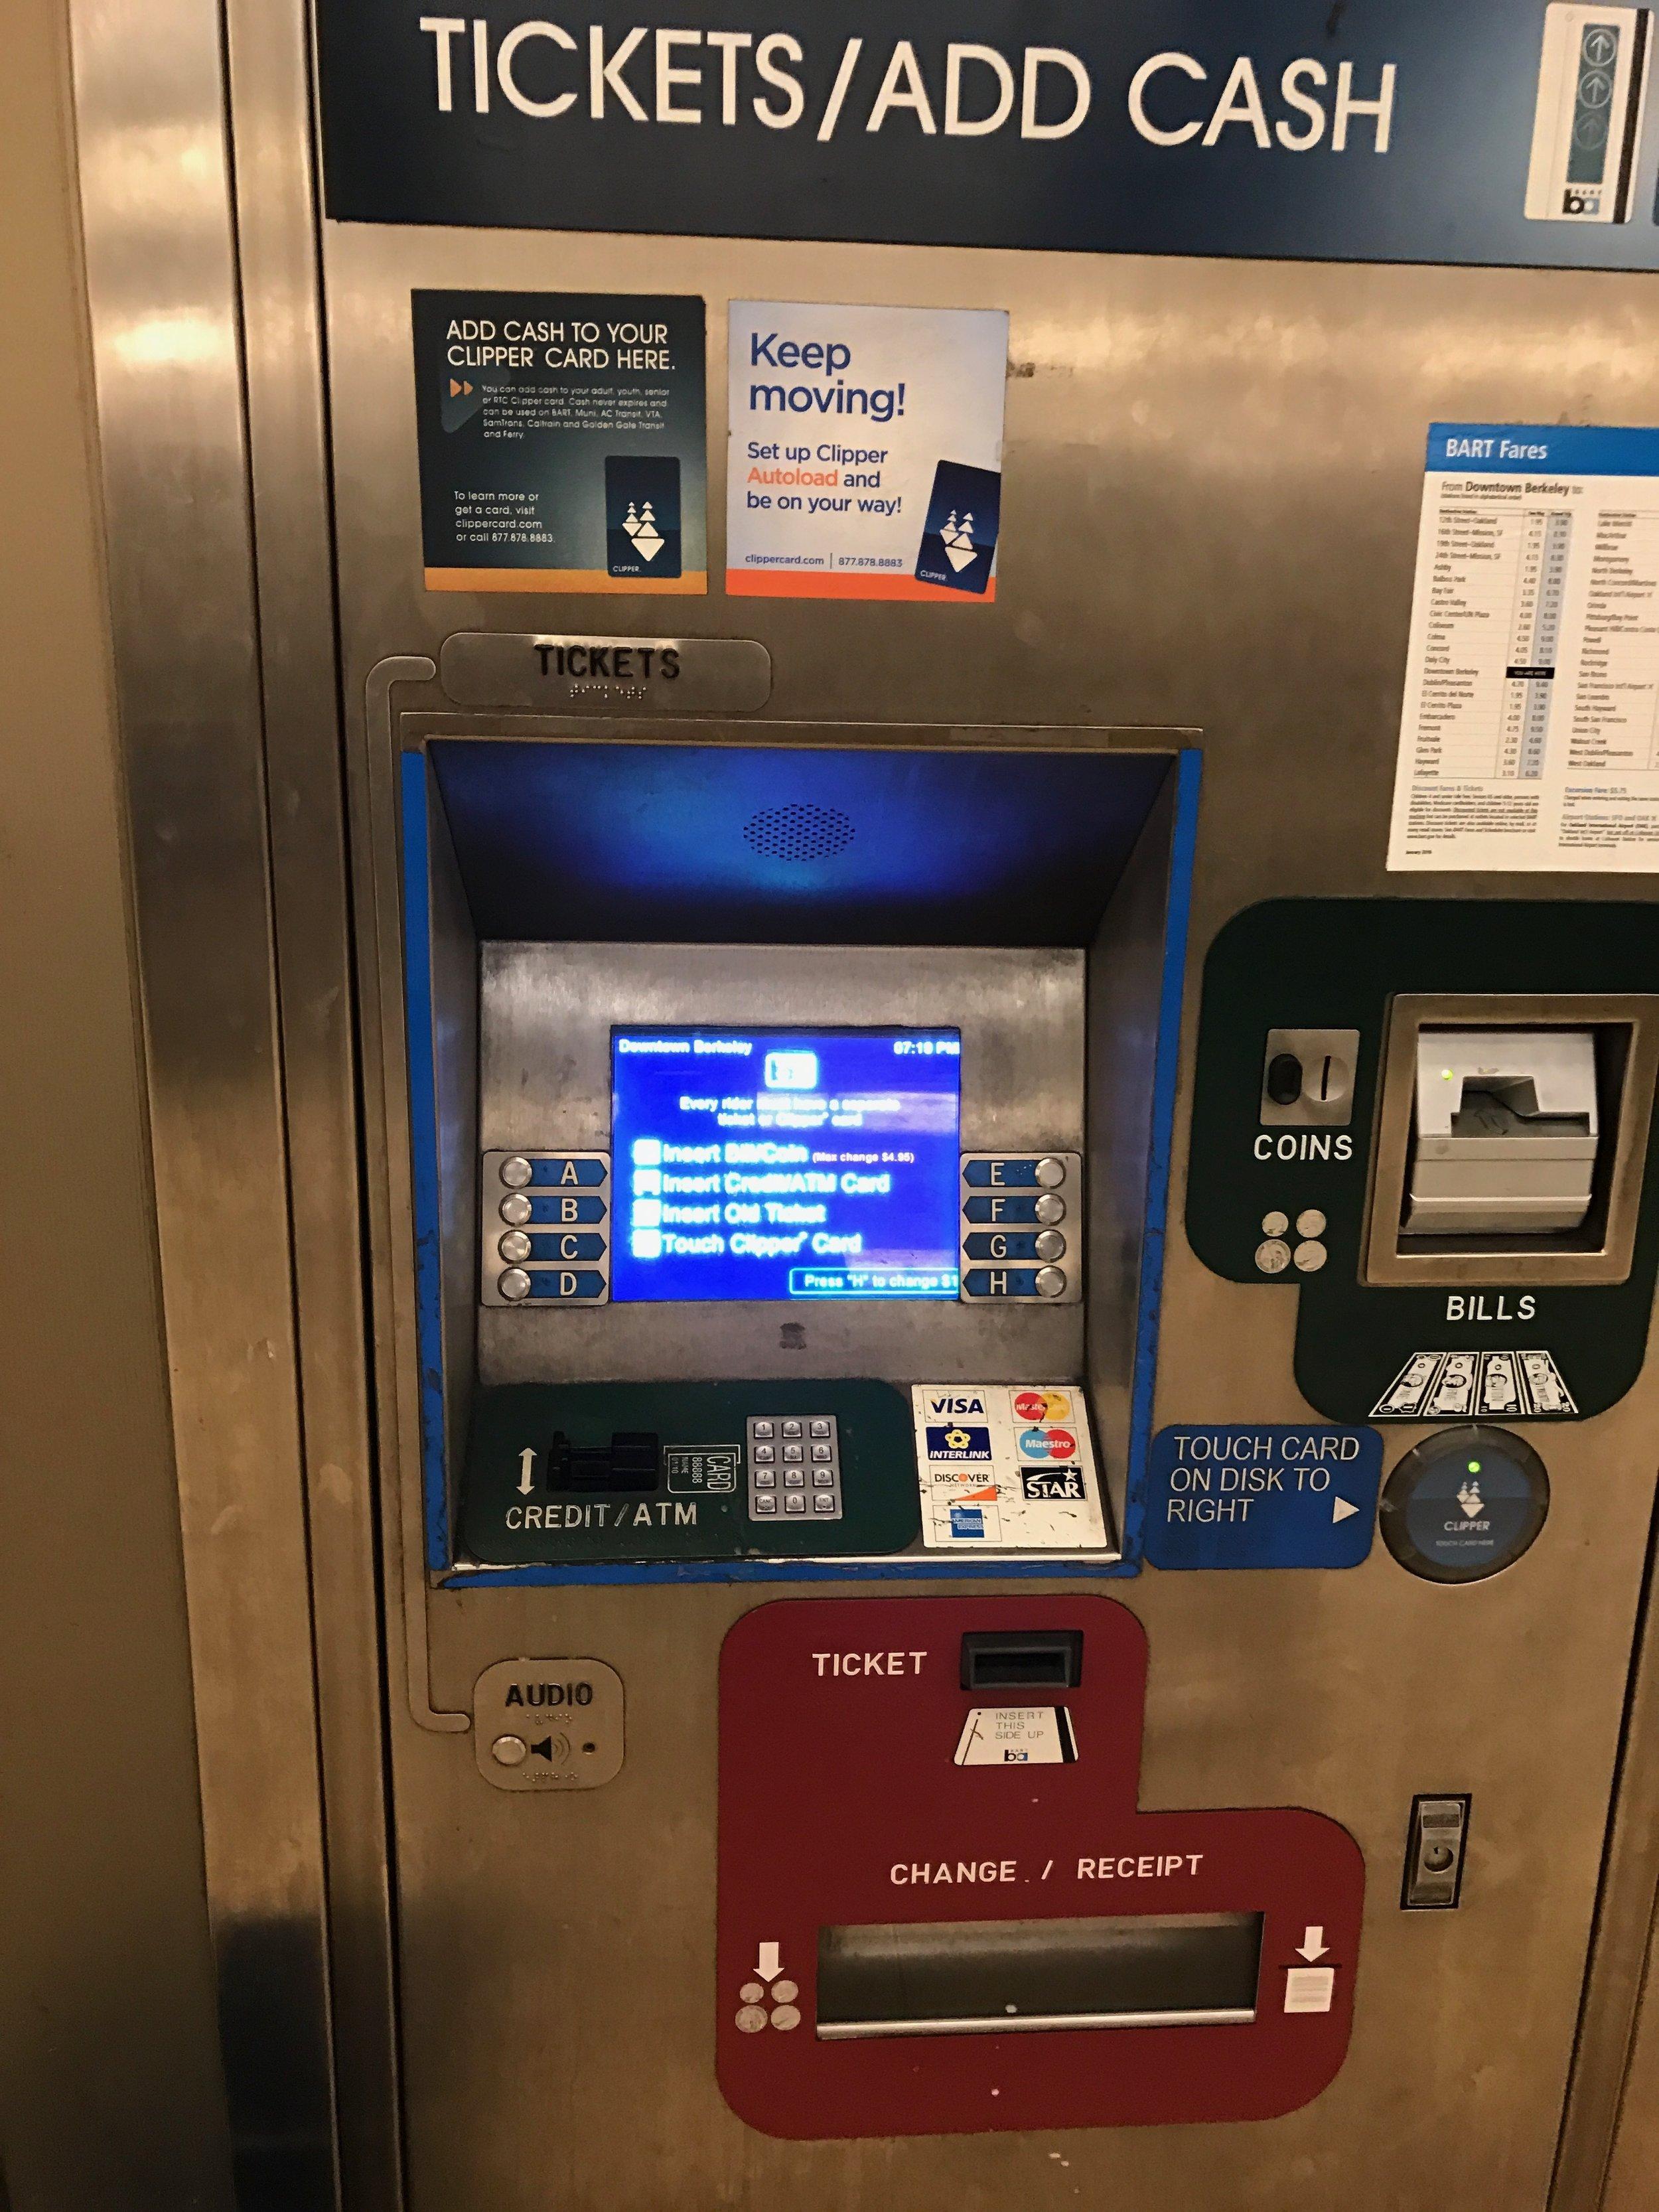 BART Ticket dispensing system